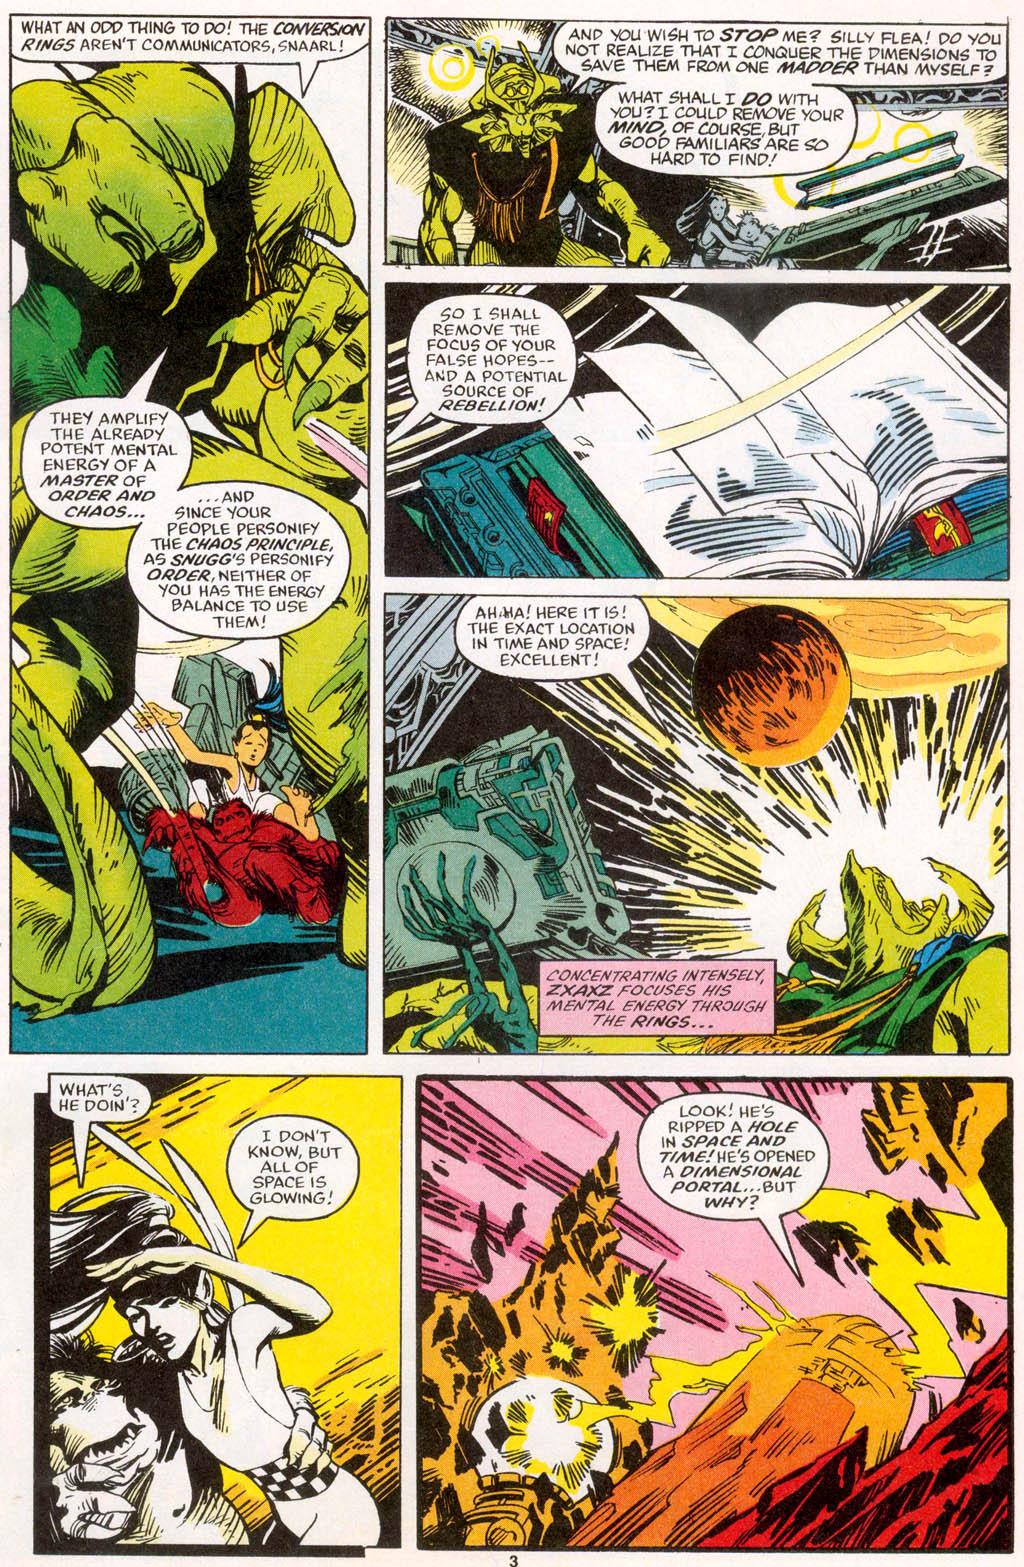 Read online Spellbound comic -  Issue #1 - 4